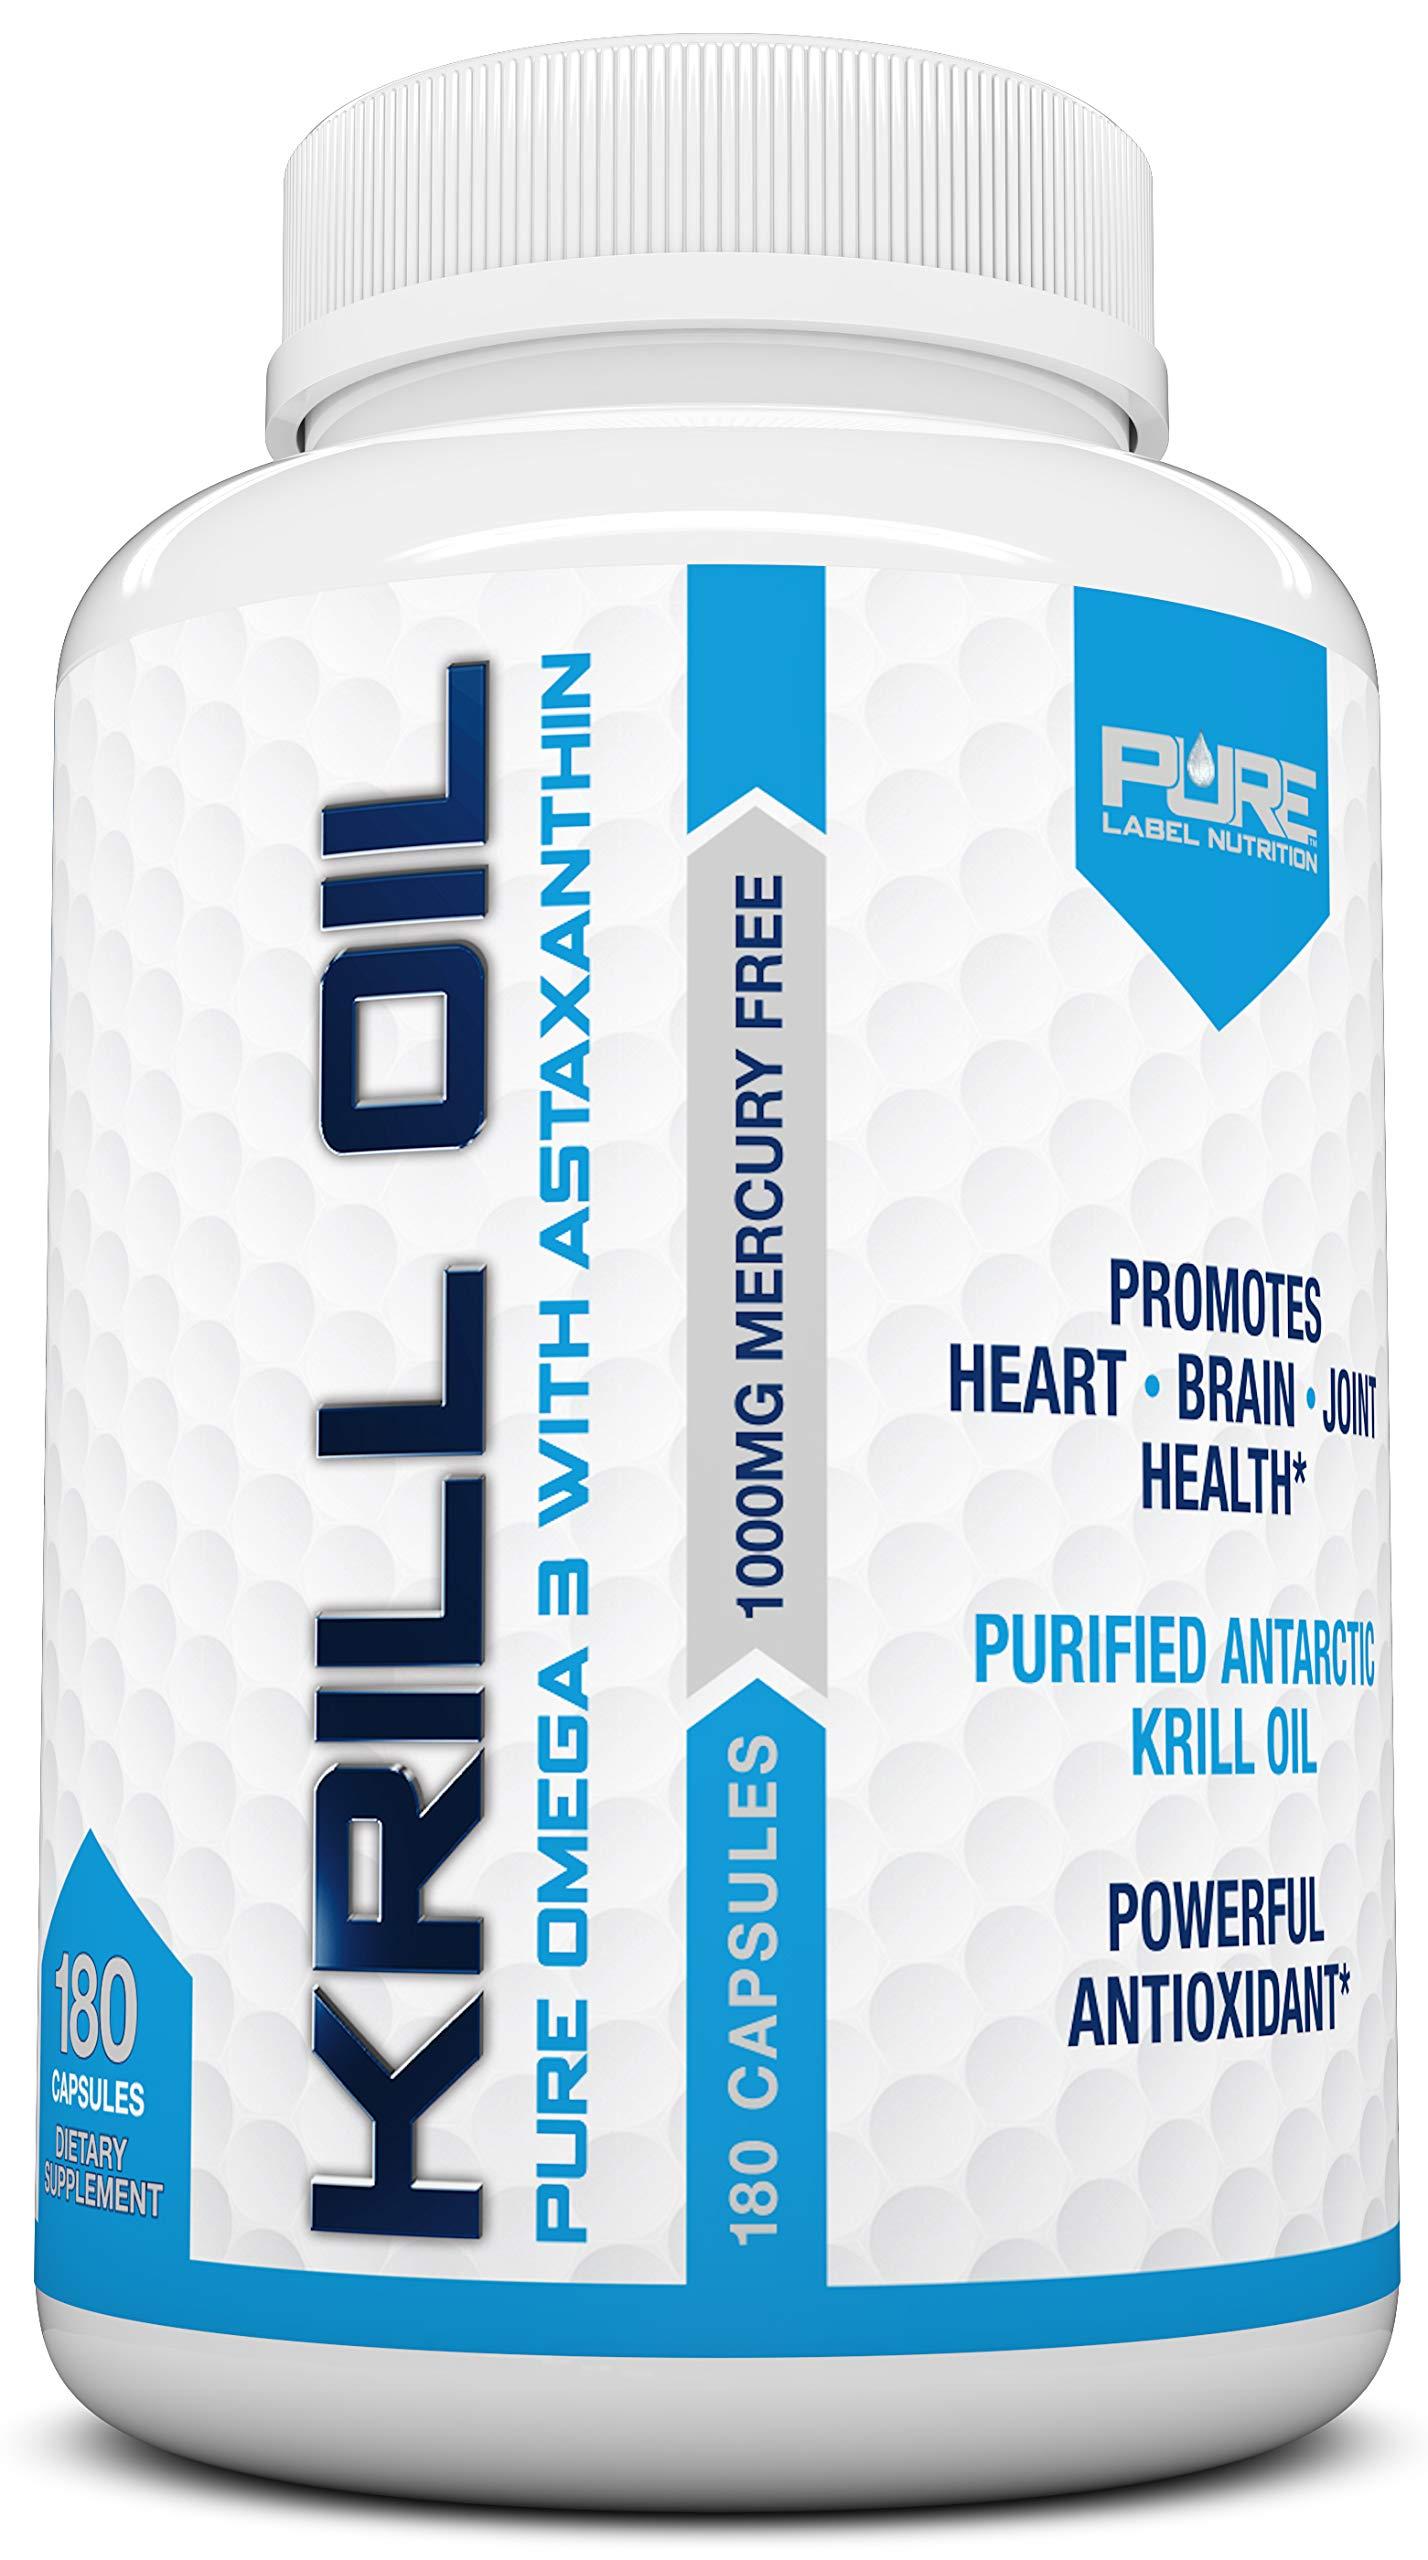 Krill Oil 1000mg with Astaxanthin 180 Caps Omega 3 6 9 - EPA DHA - 100% Purified, Mercury Free and Wild Caught - Non GMO - Gluten Free - Pure Krill Oil - Mega Dose Phospholipids (180 Capsules)